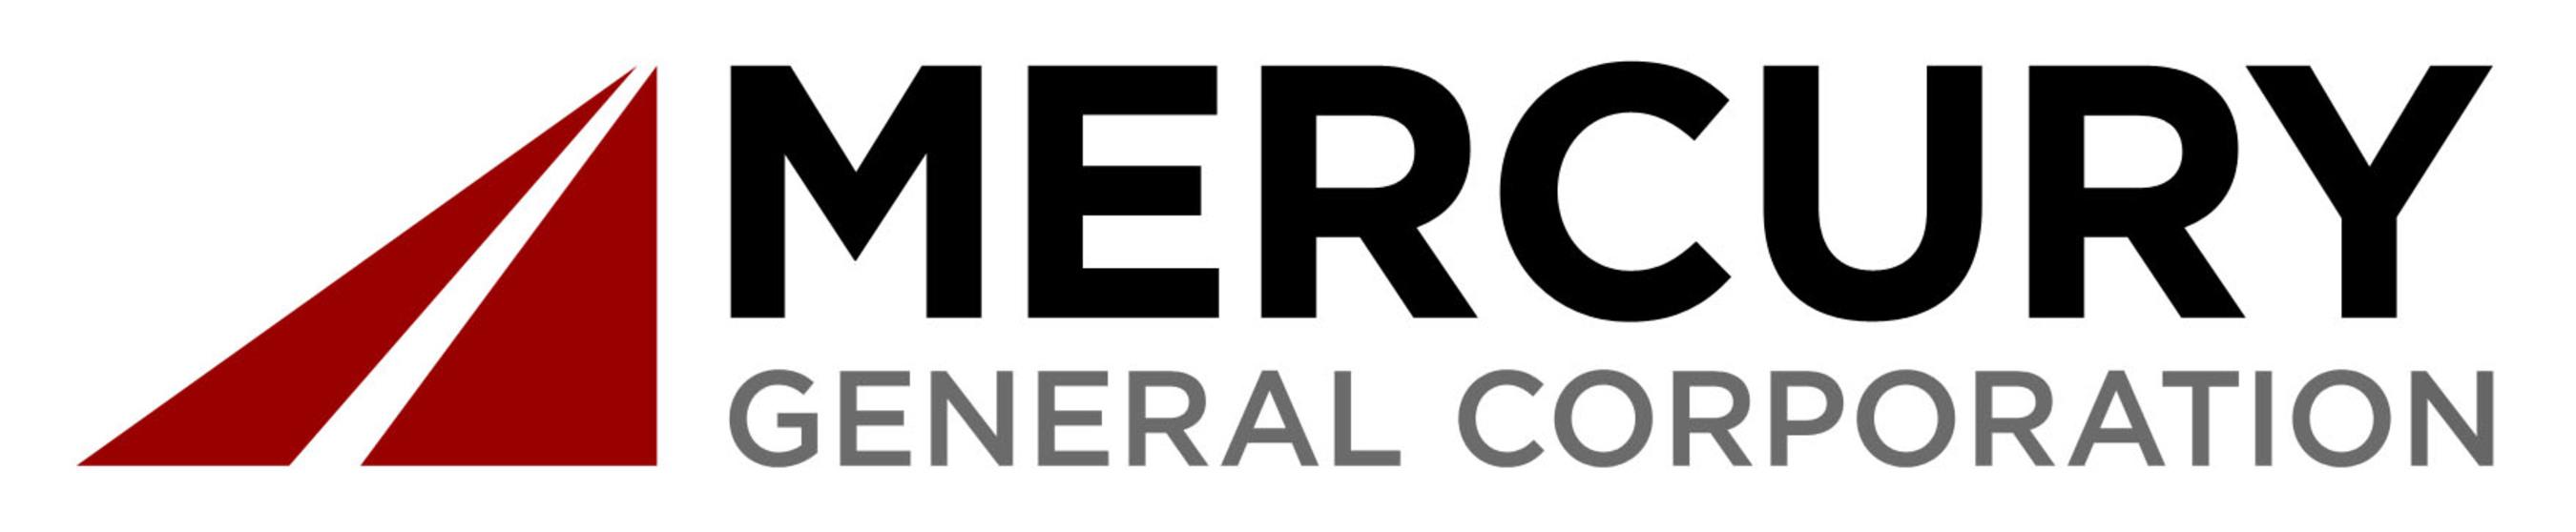 Mercury General Corporation logo